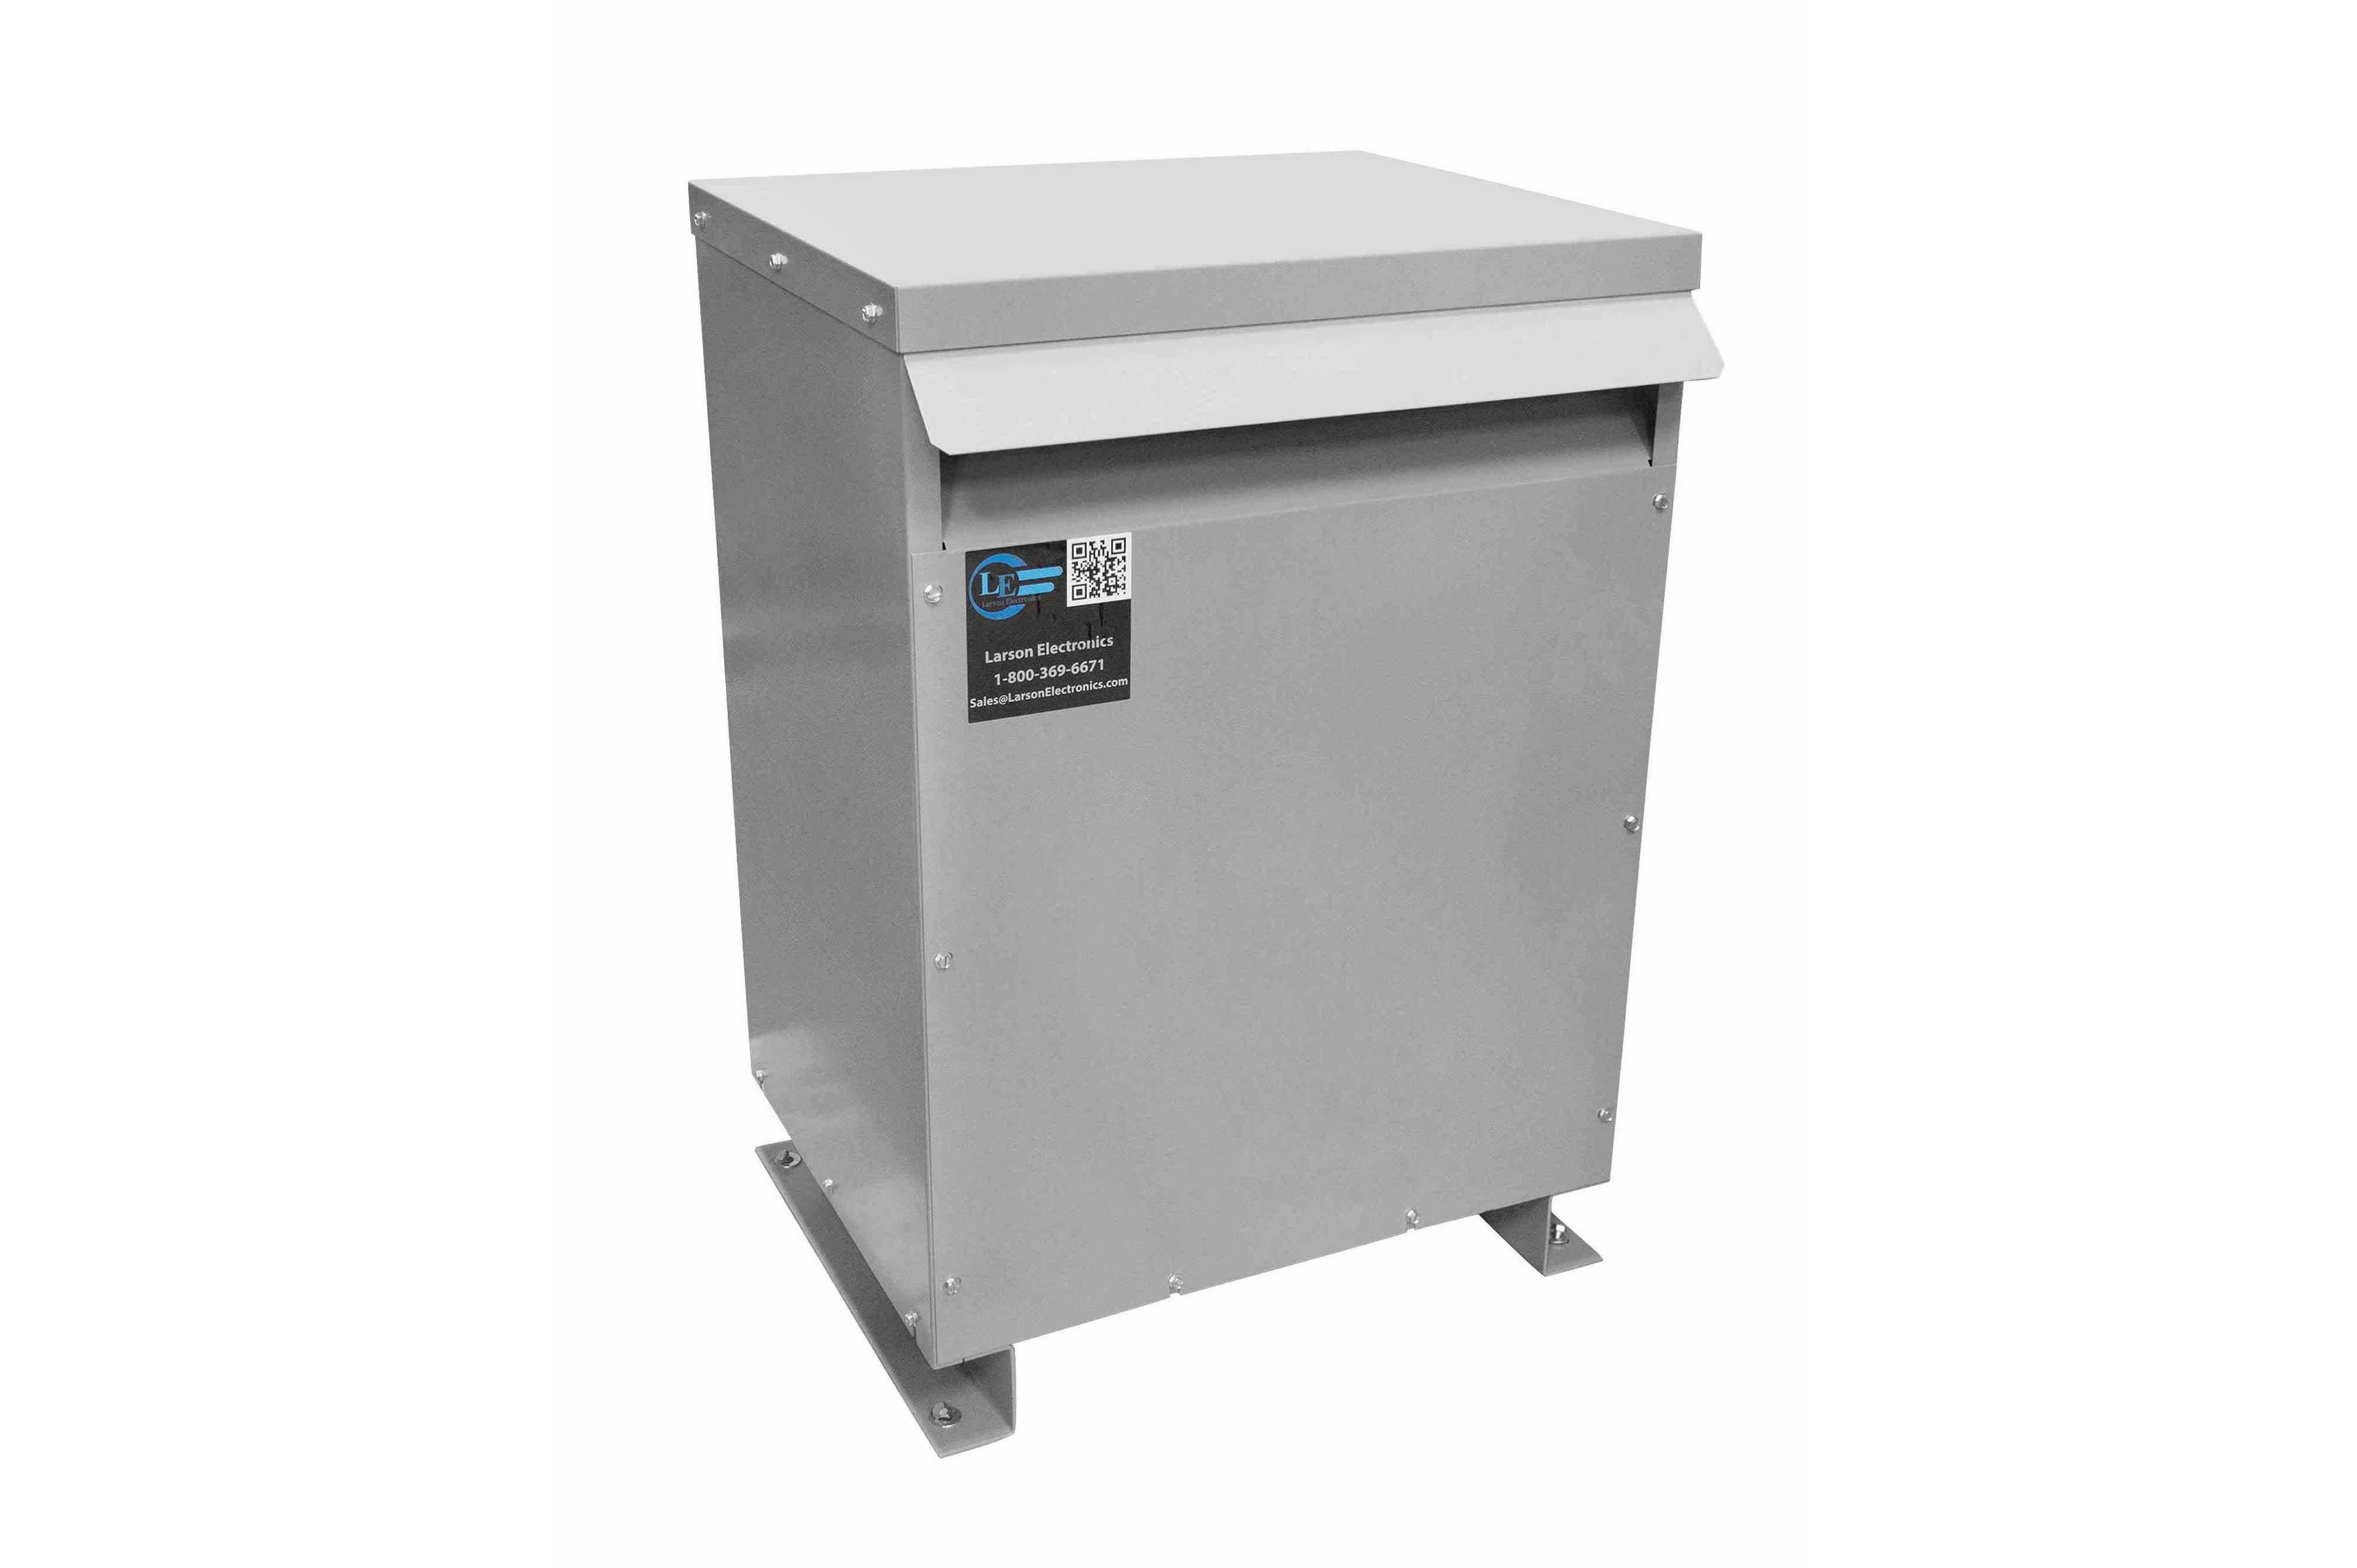 80 kVA 3PH DOE Transformer, 208V Delta Primary, 400Y/231 Wye-N Secondary, N3R, Ventilated, 60 Hz